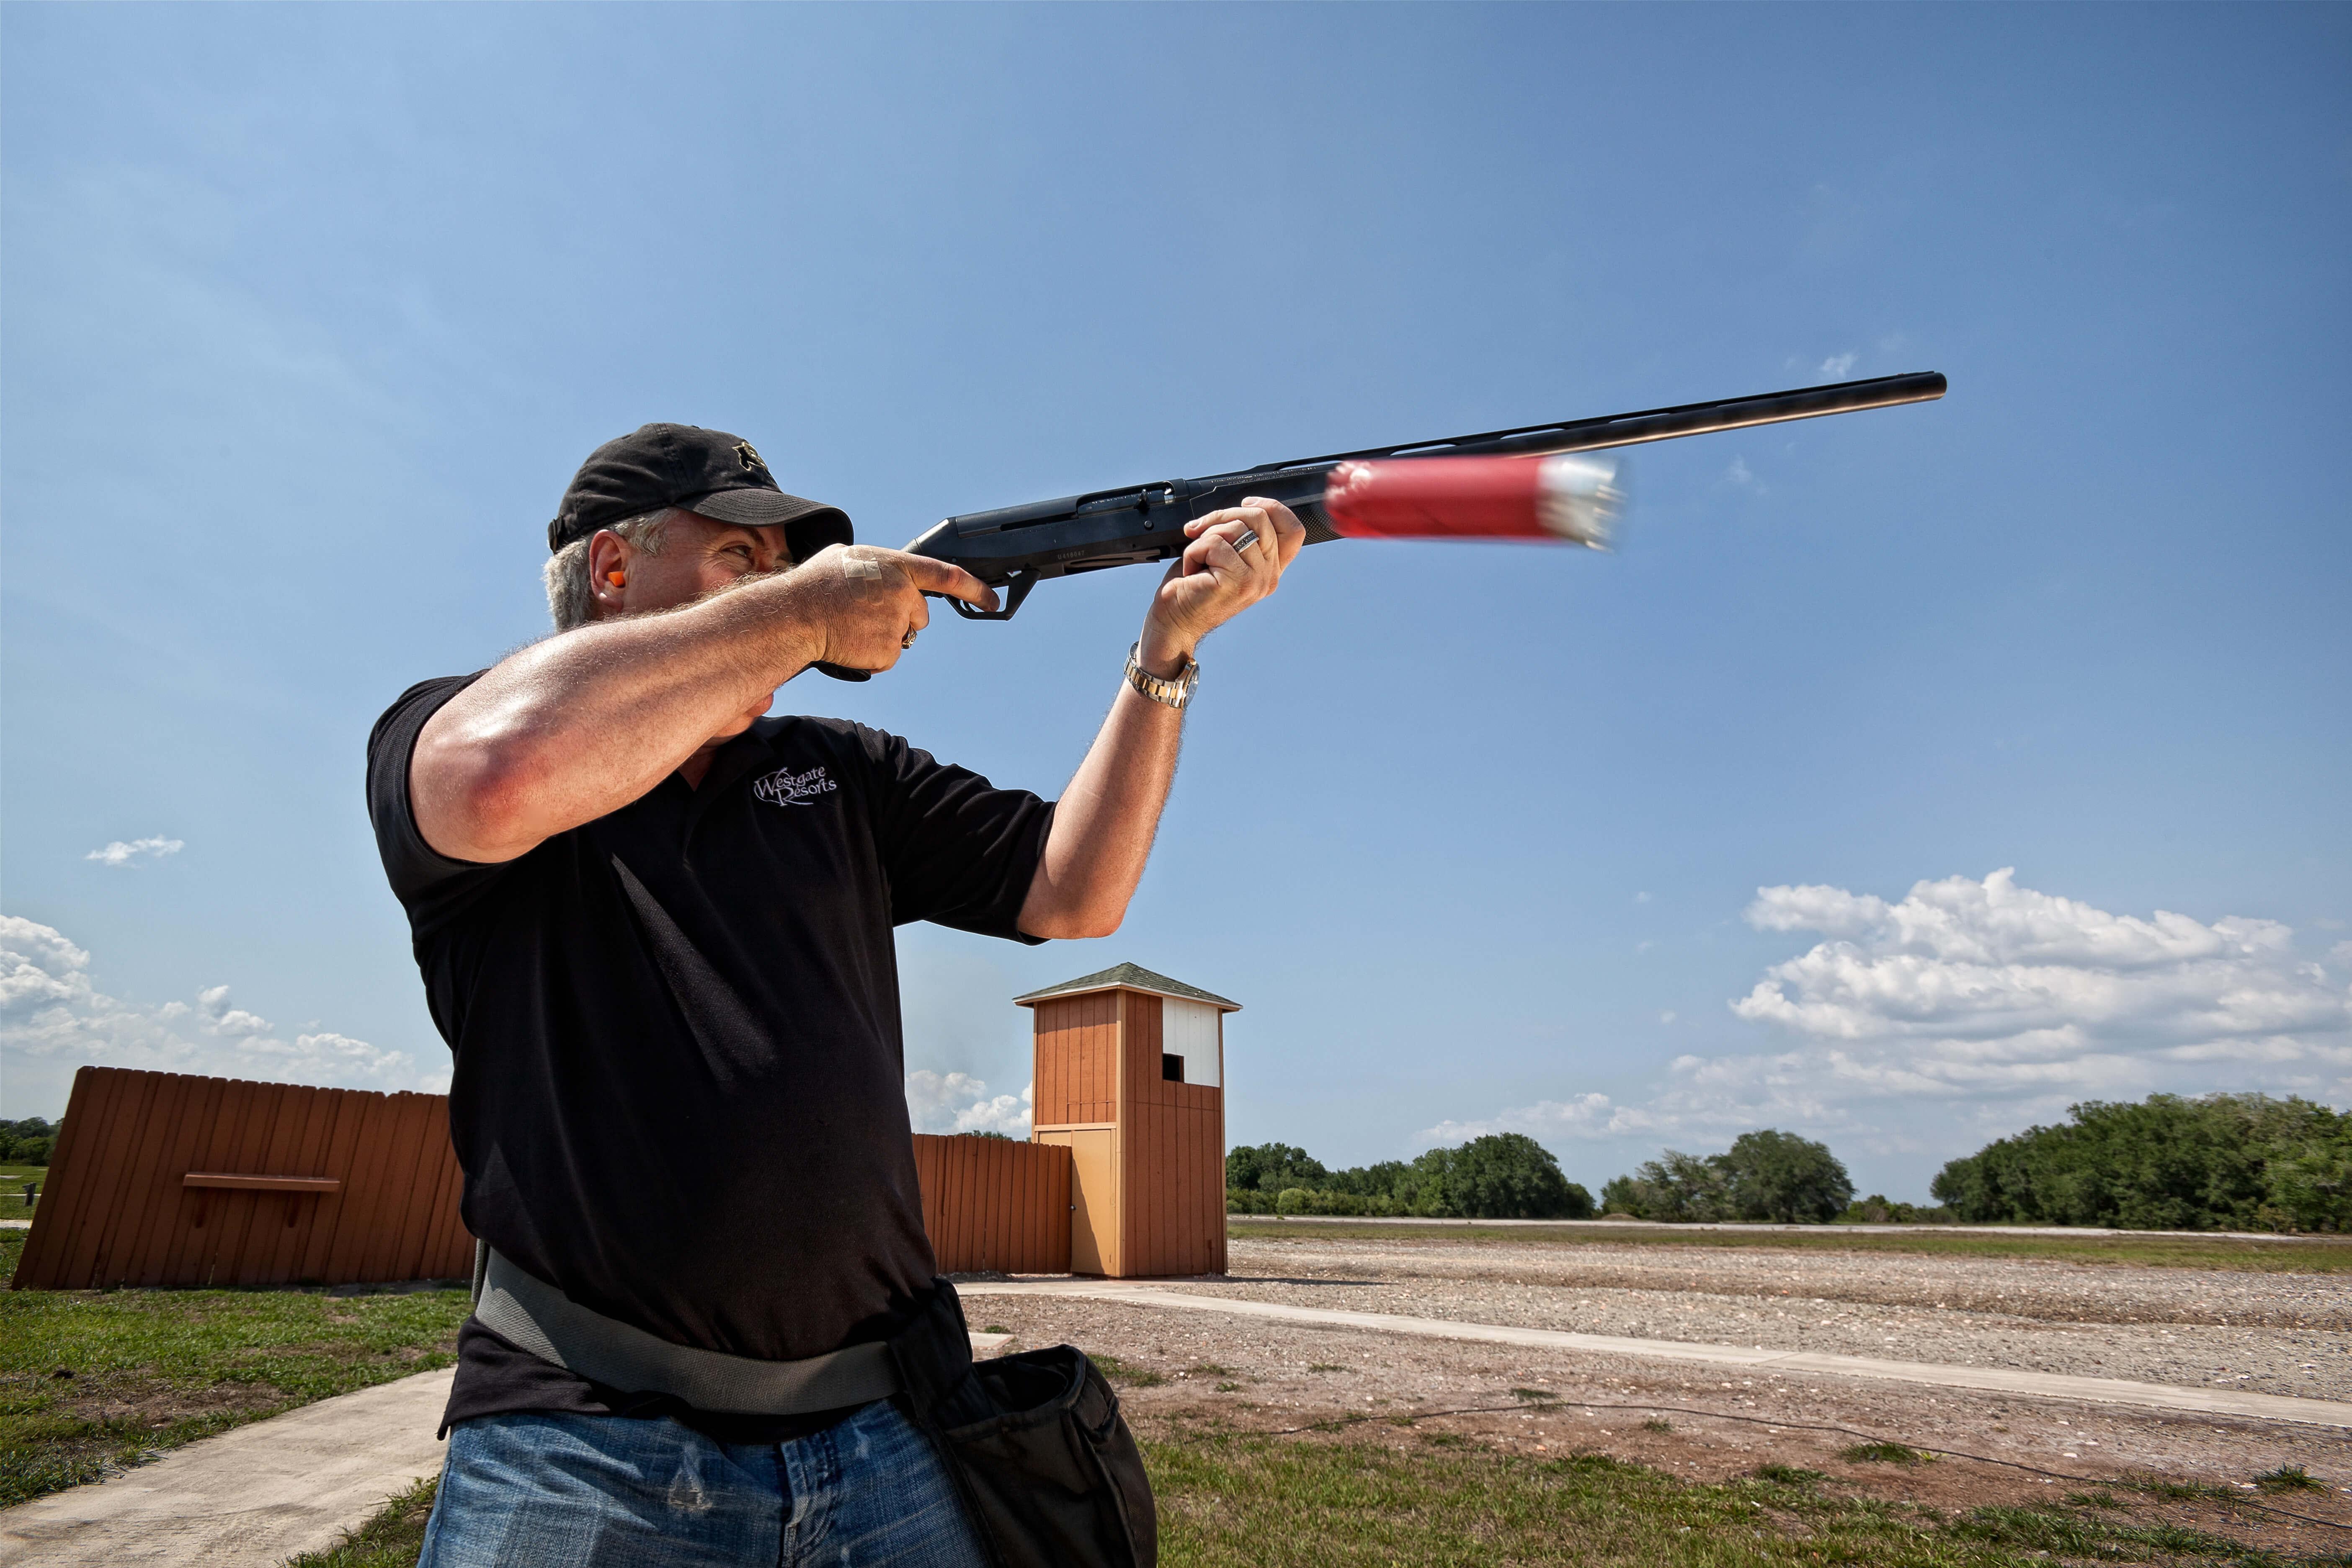 Guest taking target practice at Trap & Skeet Range | Westgate River Ranch Resort & Rodeo | Westgate Resorts